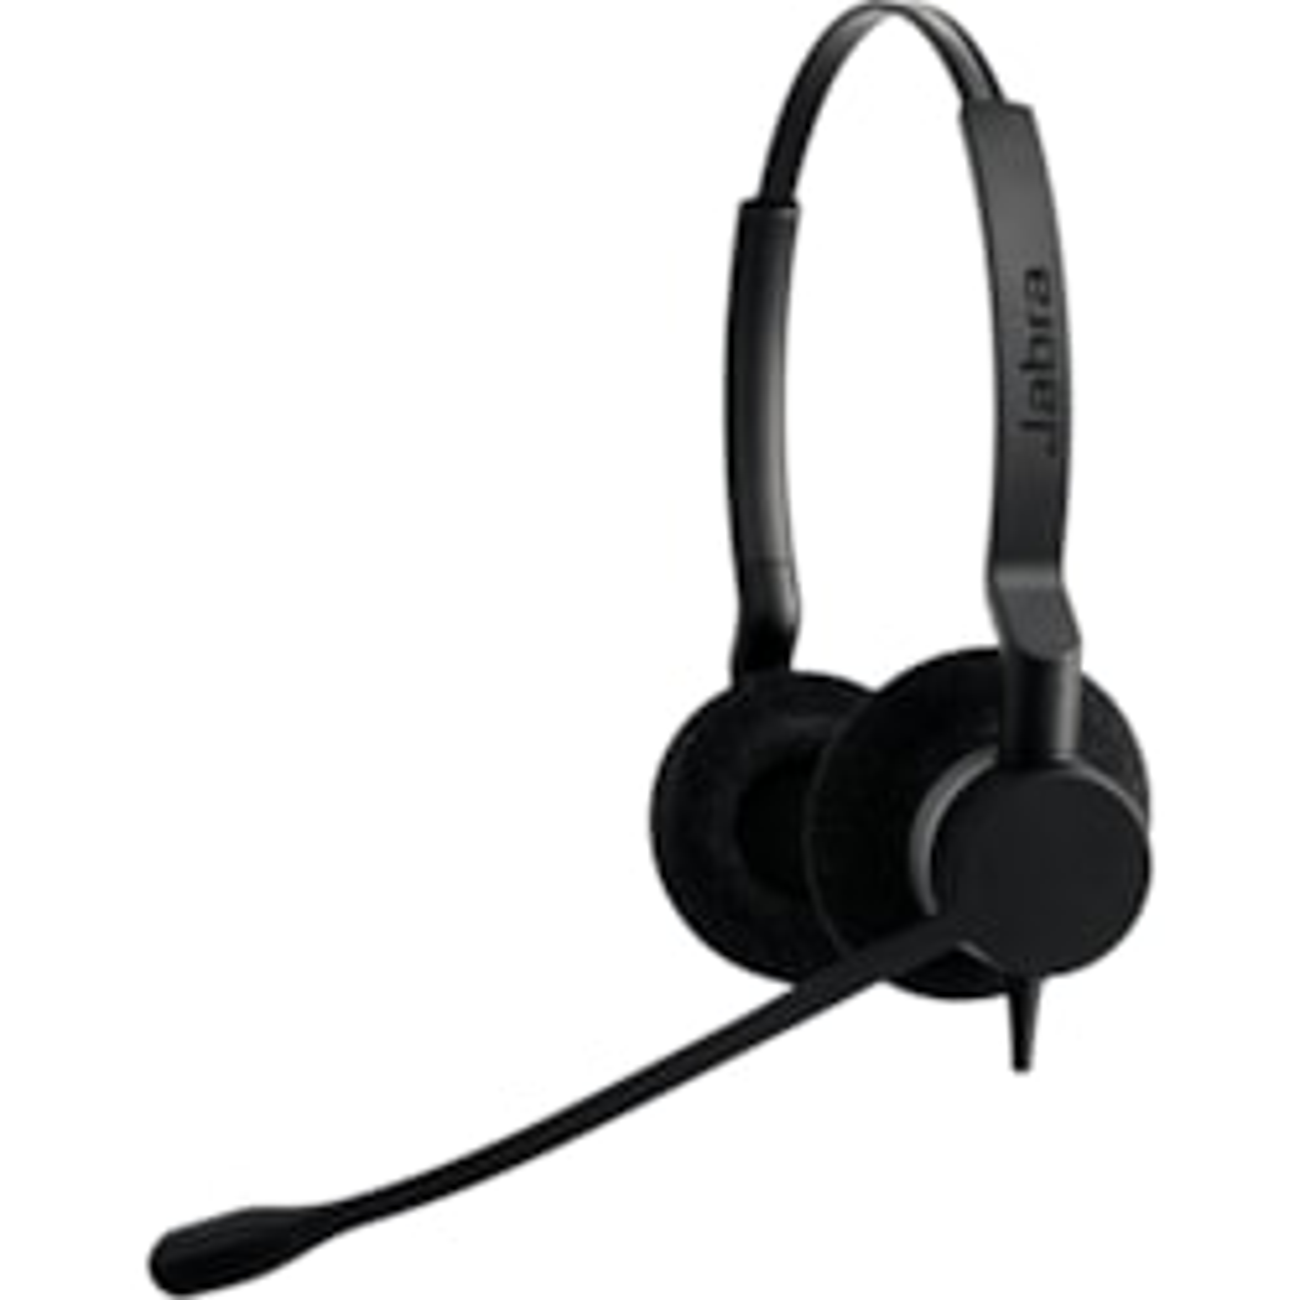 Jabra BIZ 2300 USB Wired Stereo Headset - Over-the-head - Supra-aural